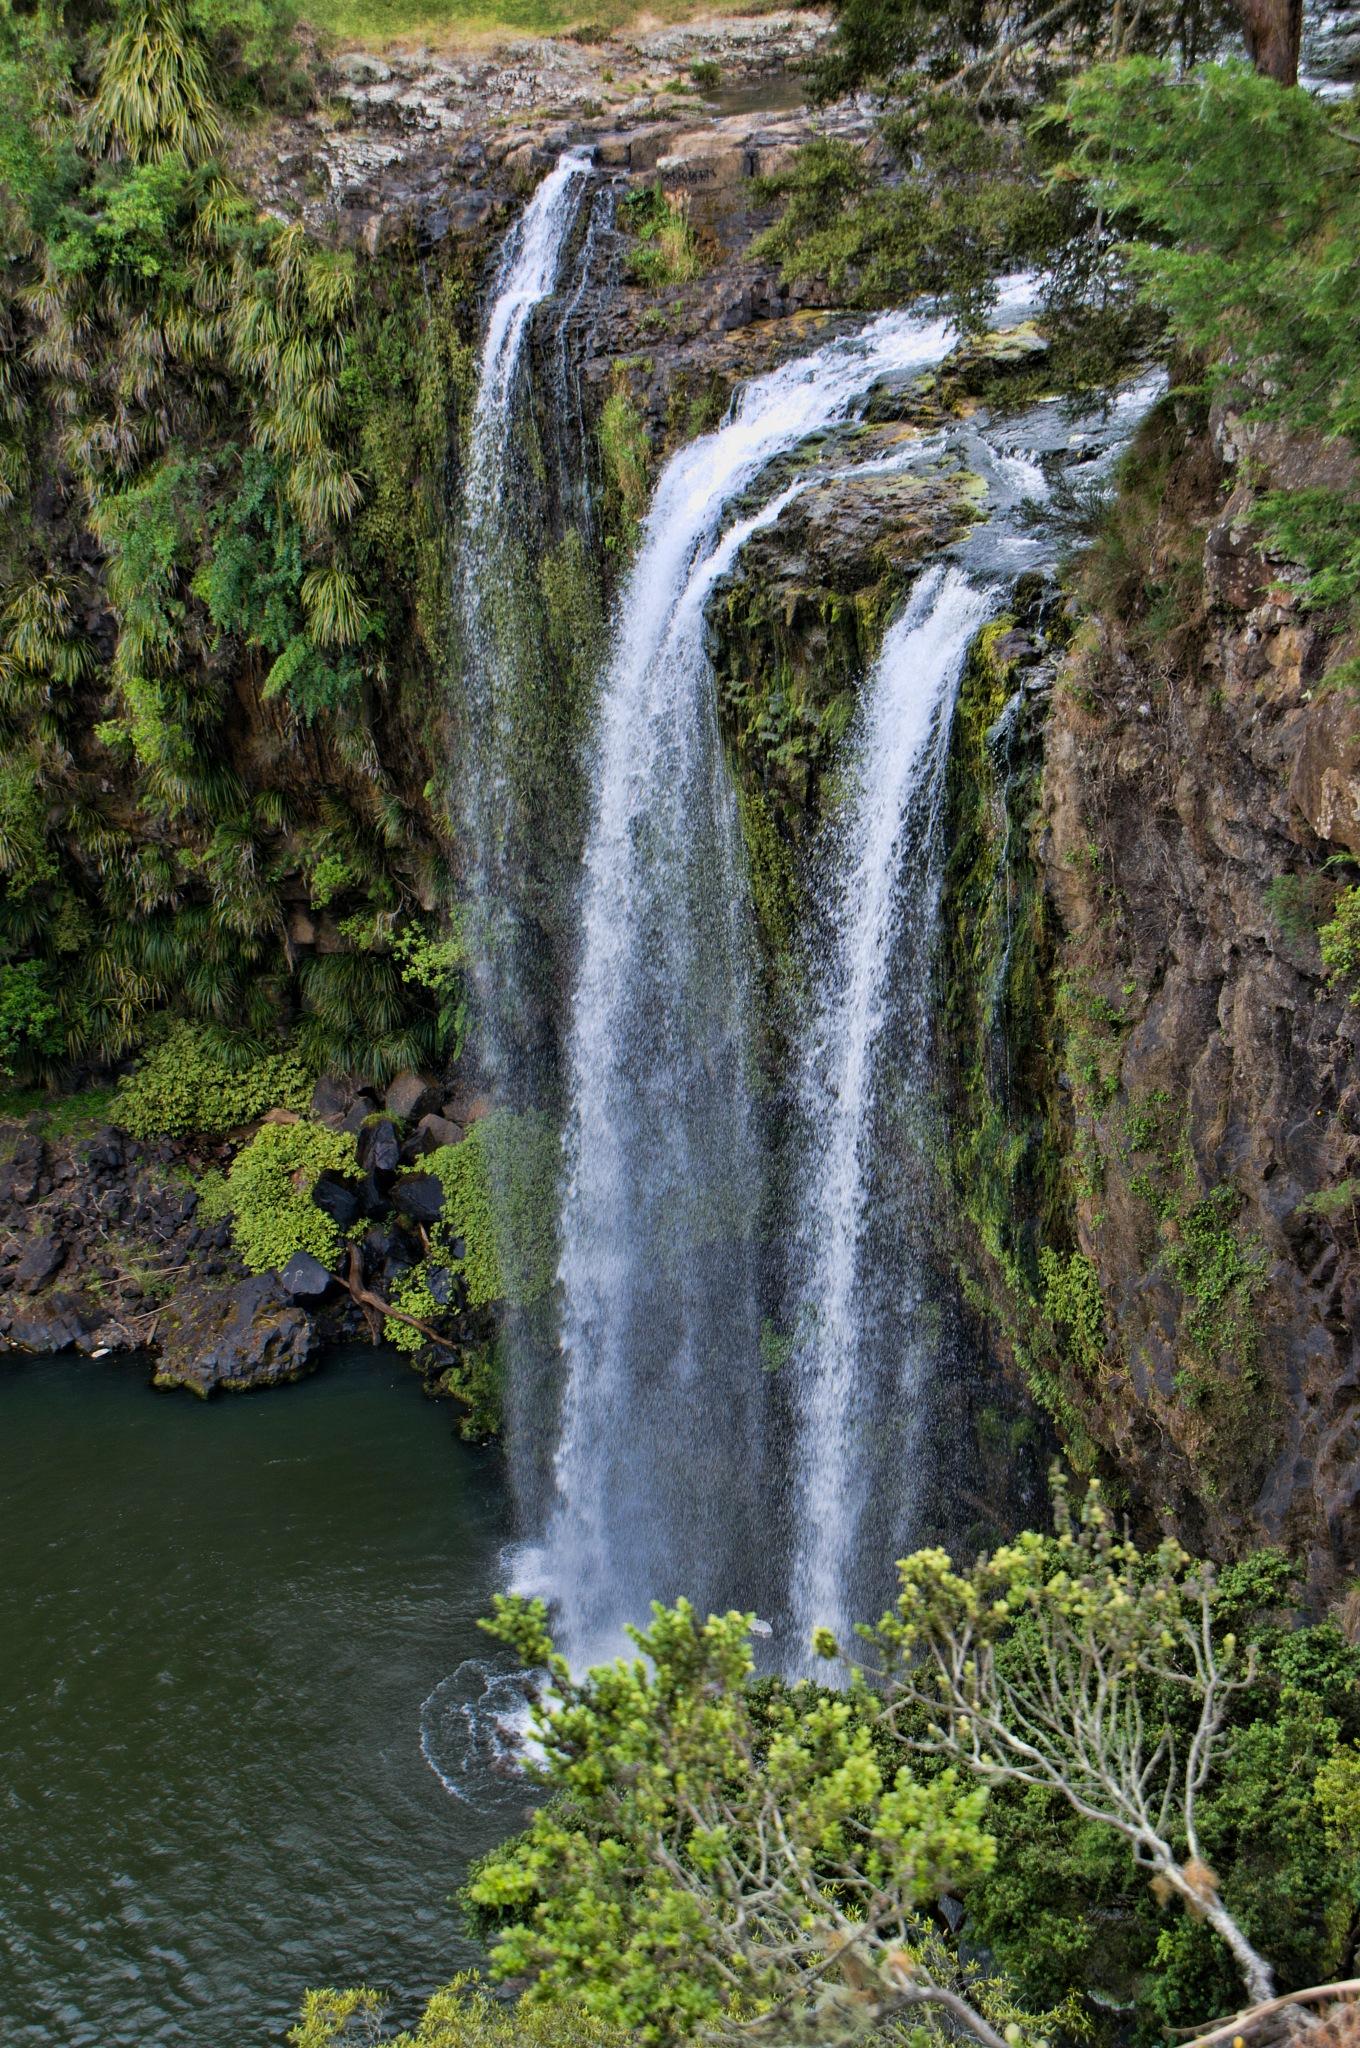 Scenic Whangarei Falls by Derek Clarke